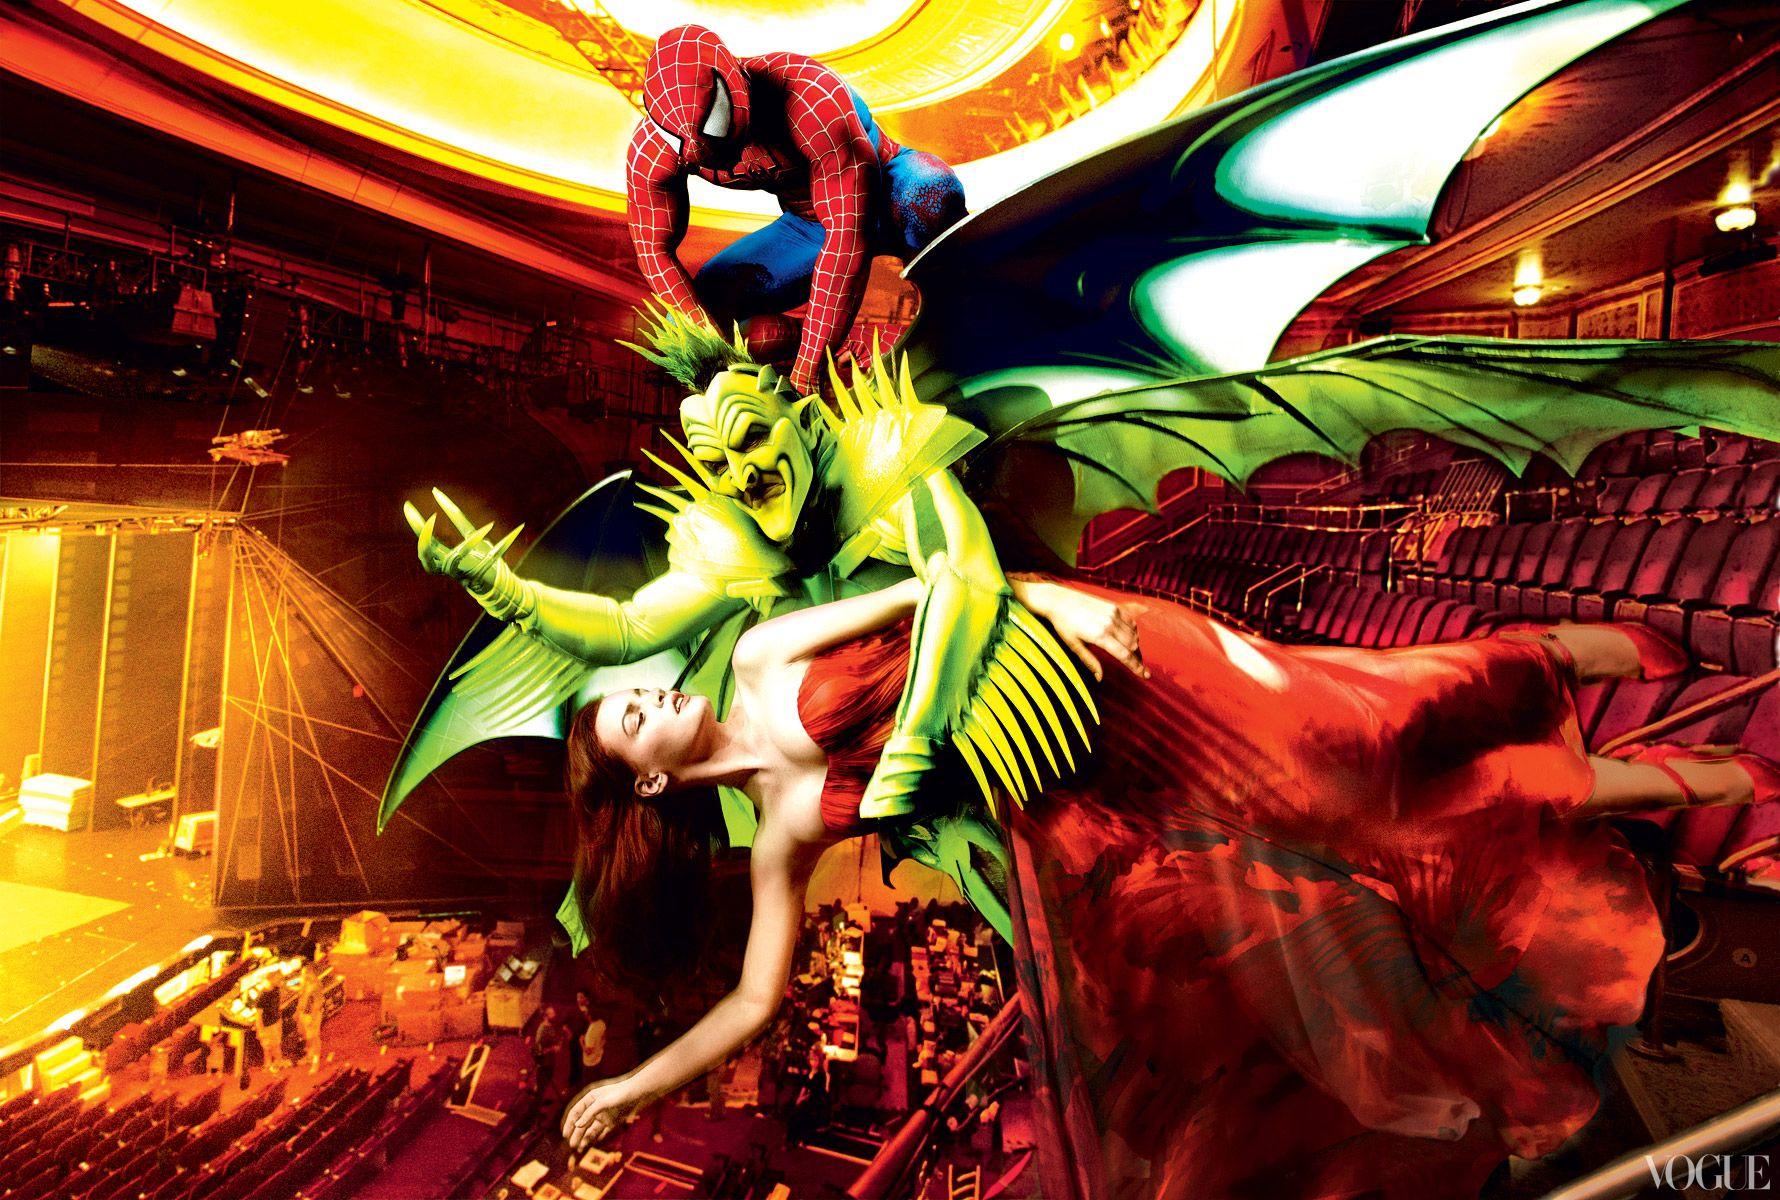 Vogue Superheroes